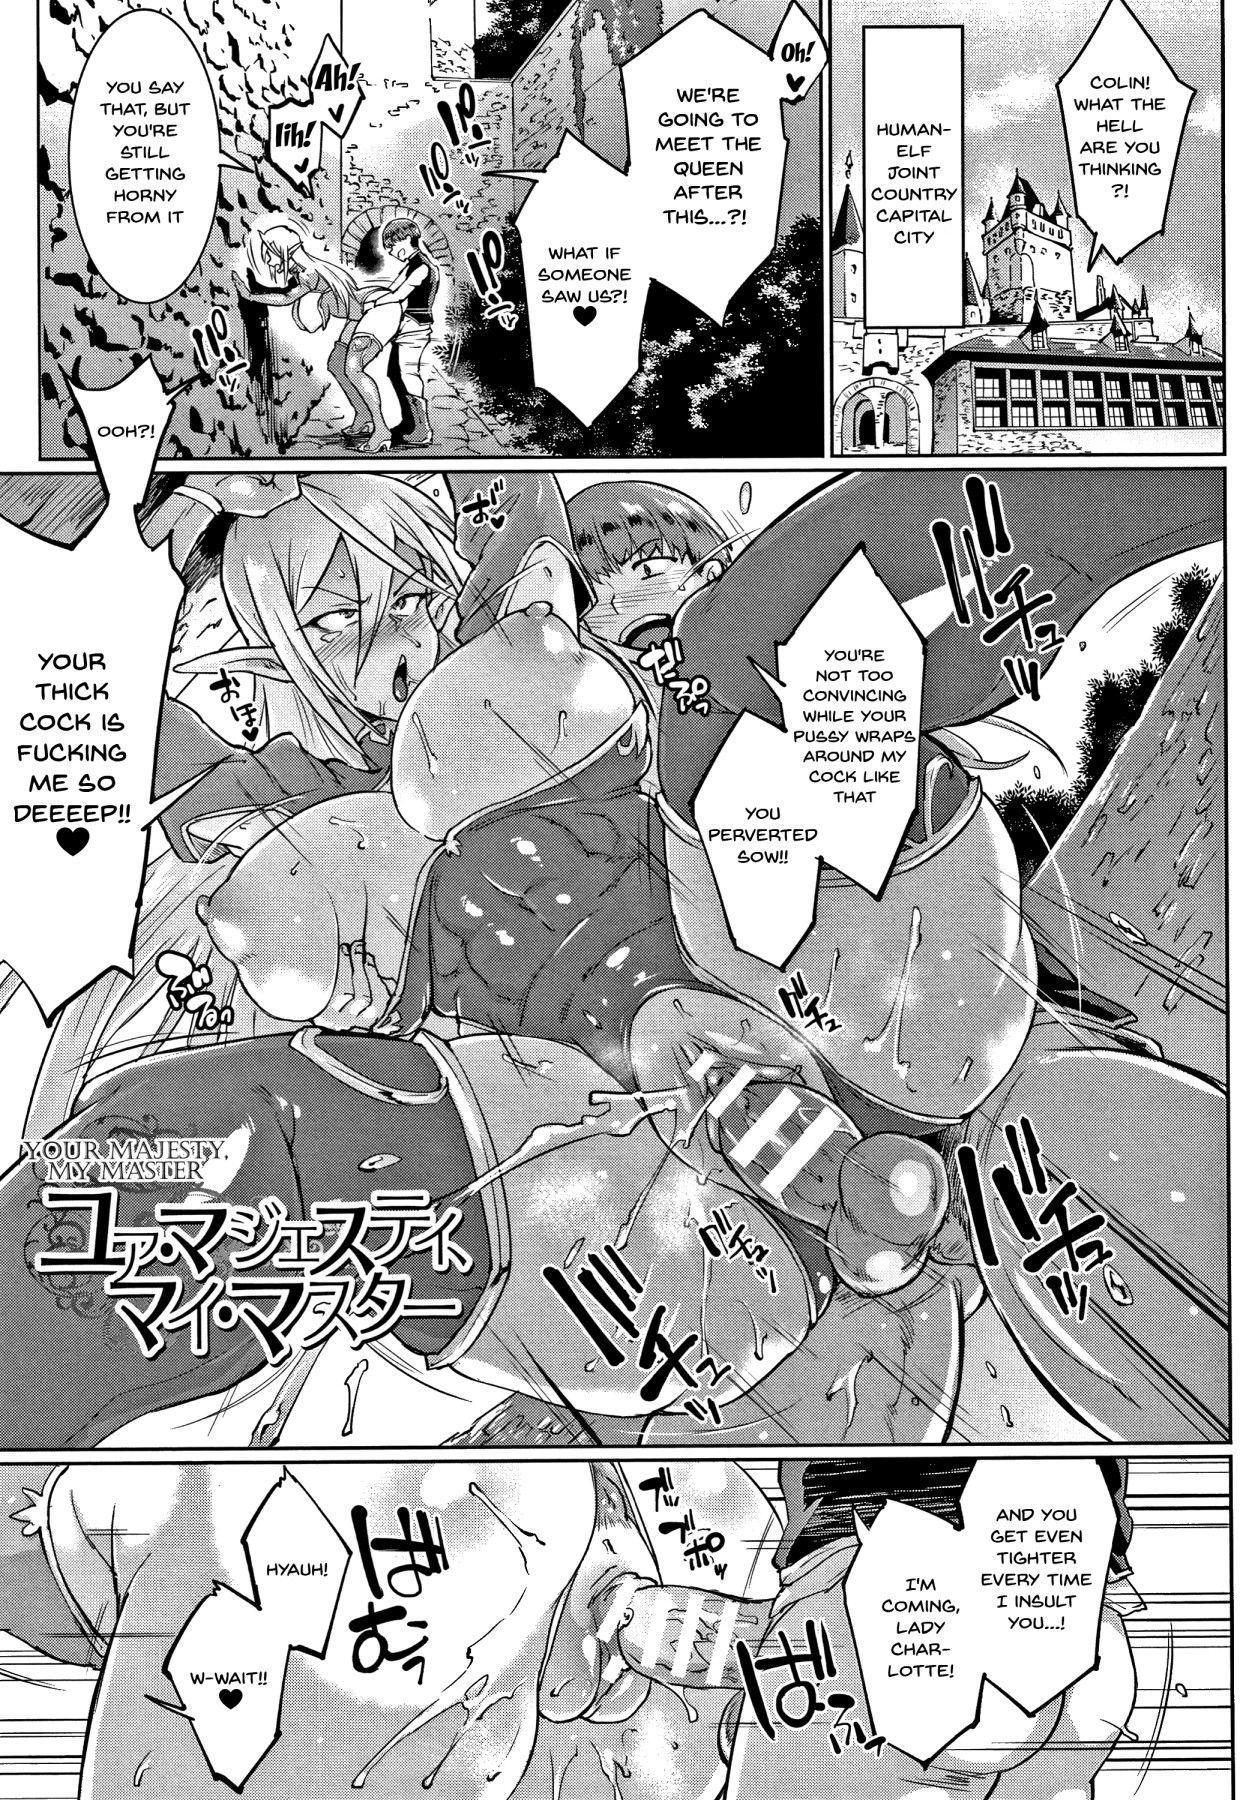 [Fan no Hitori] Sennen Reijou ~ My Lady, My Master ~  Ch.1-2 [English] {Doujins.com} 31